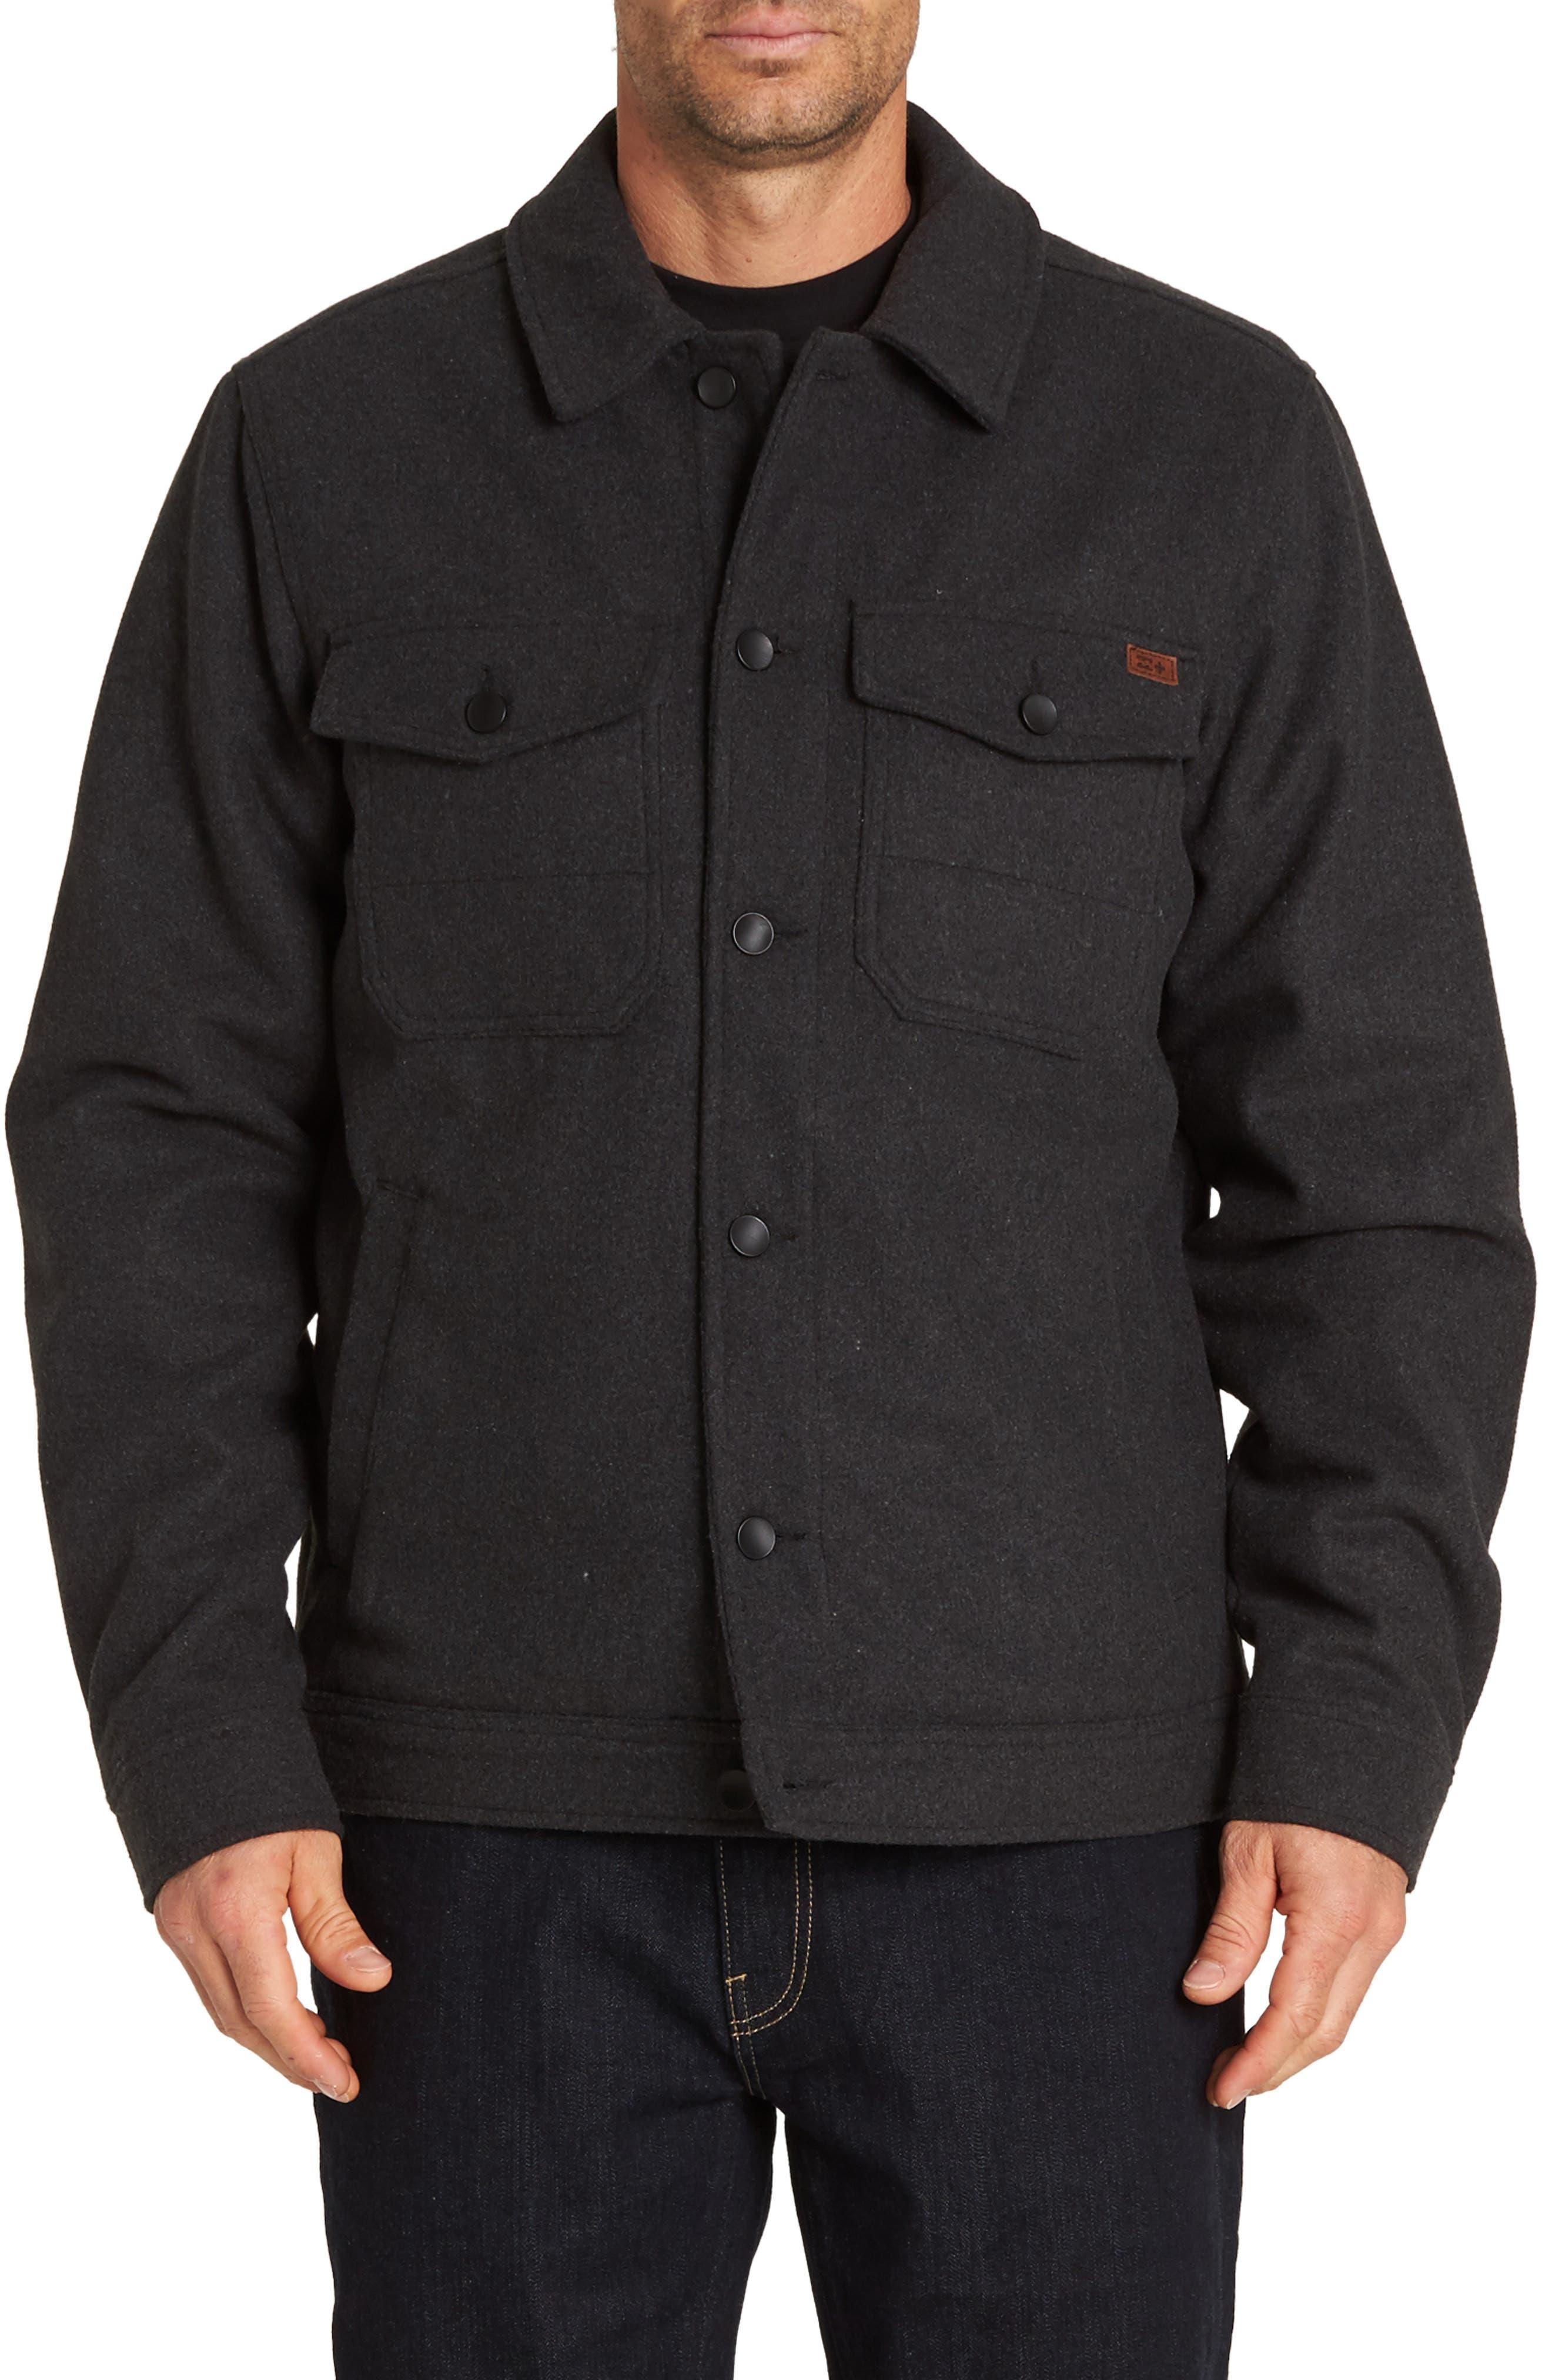 Barlow Jacket,                         Main,                         color, BLACK HEATHER